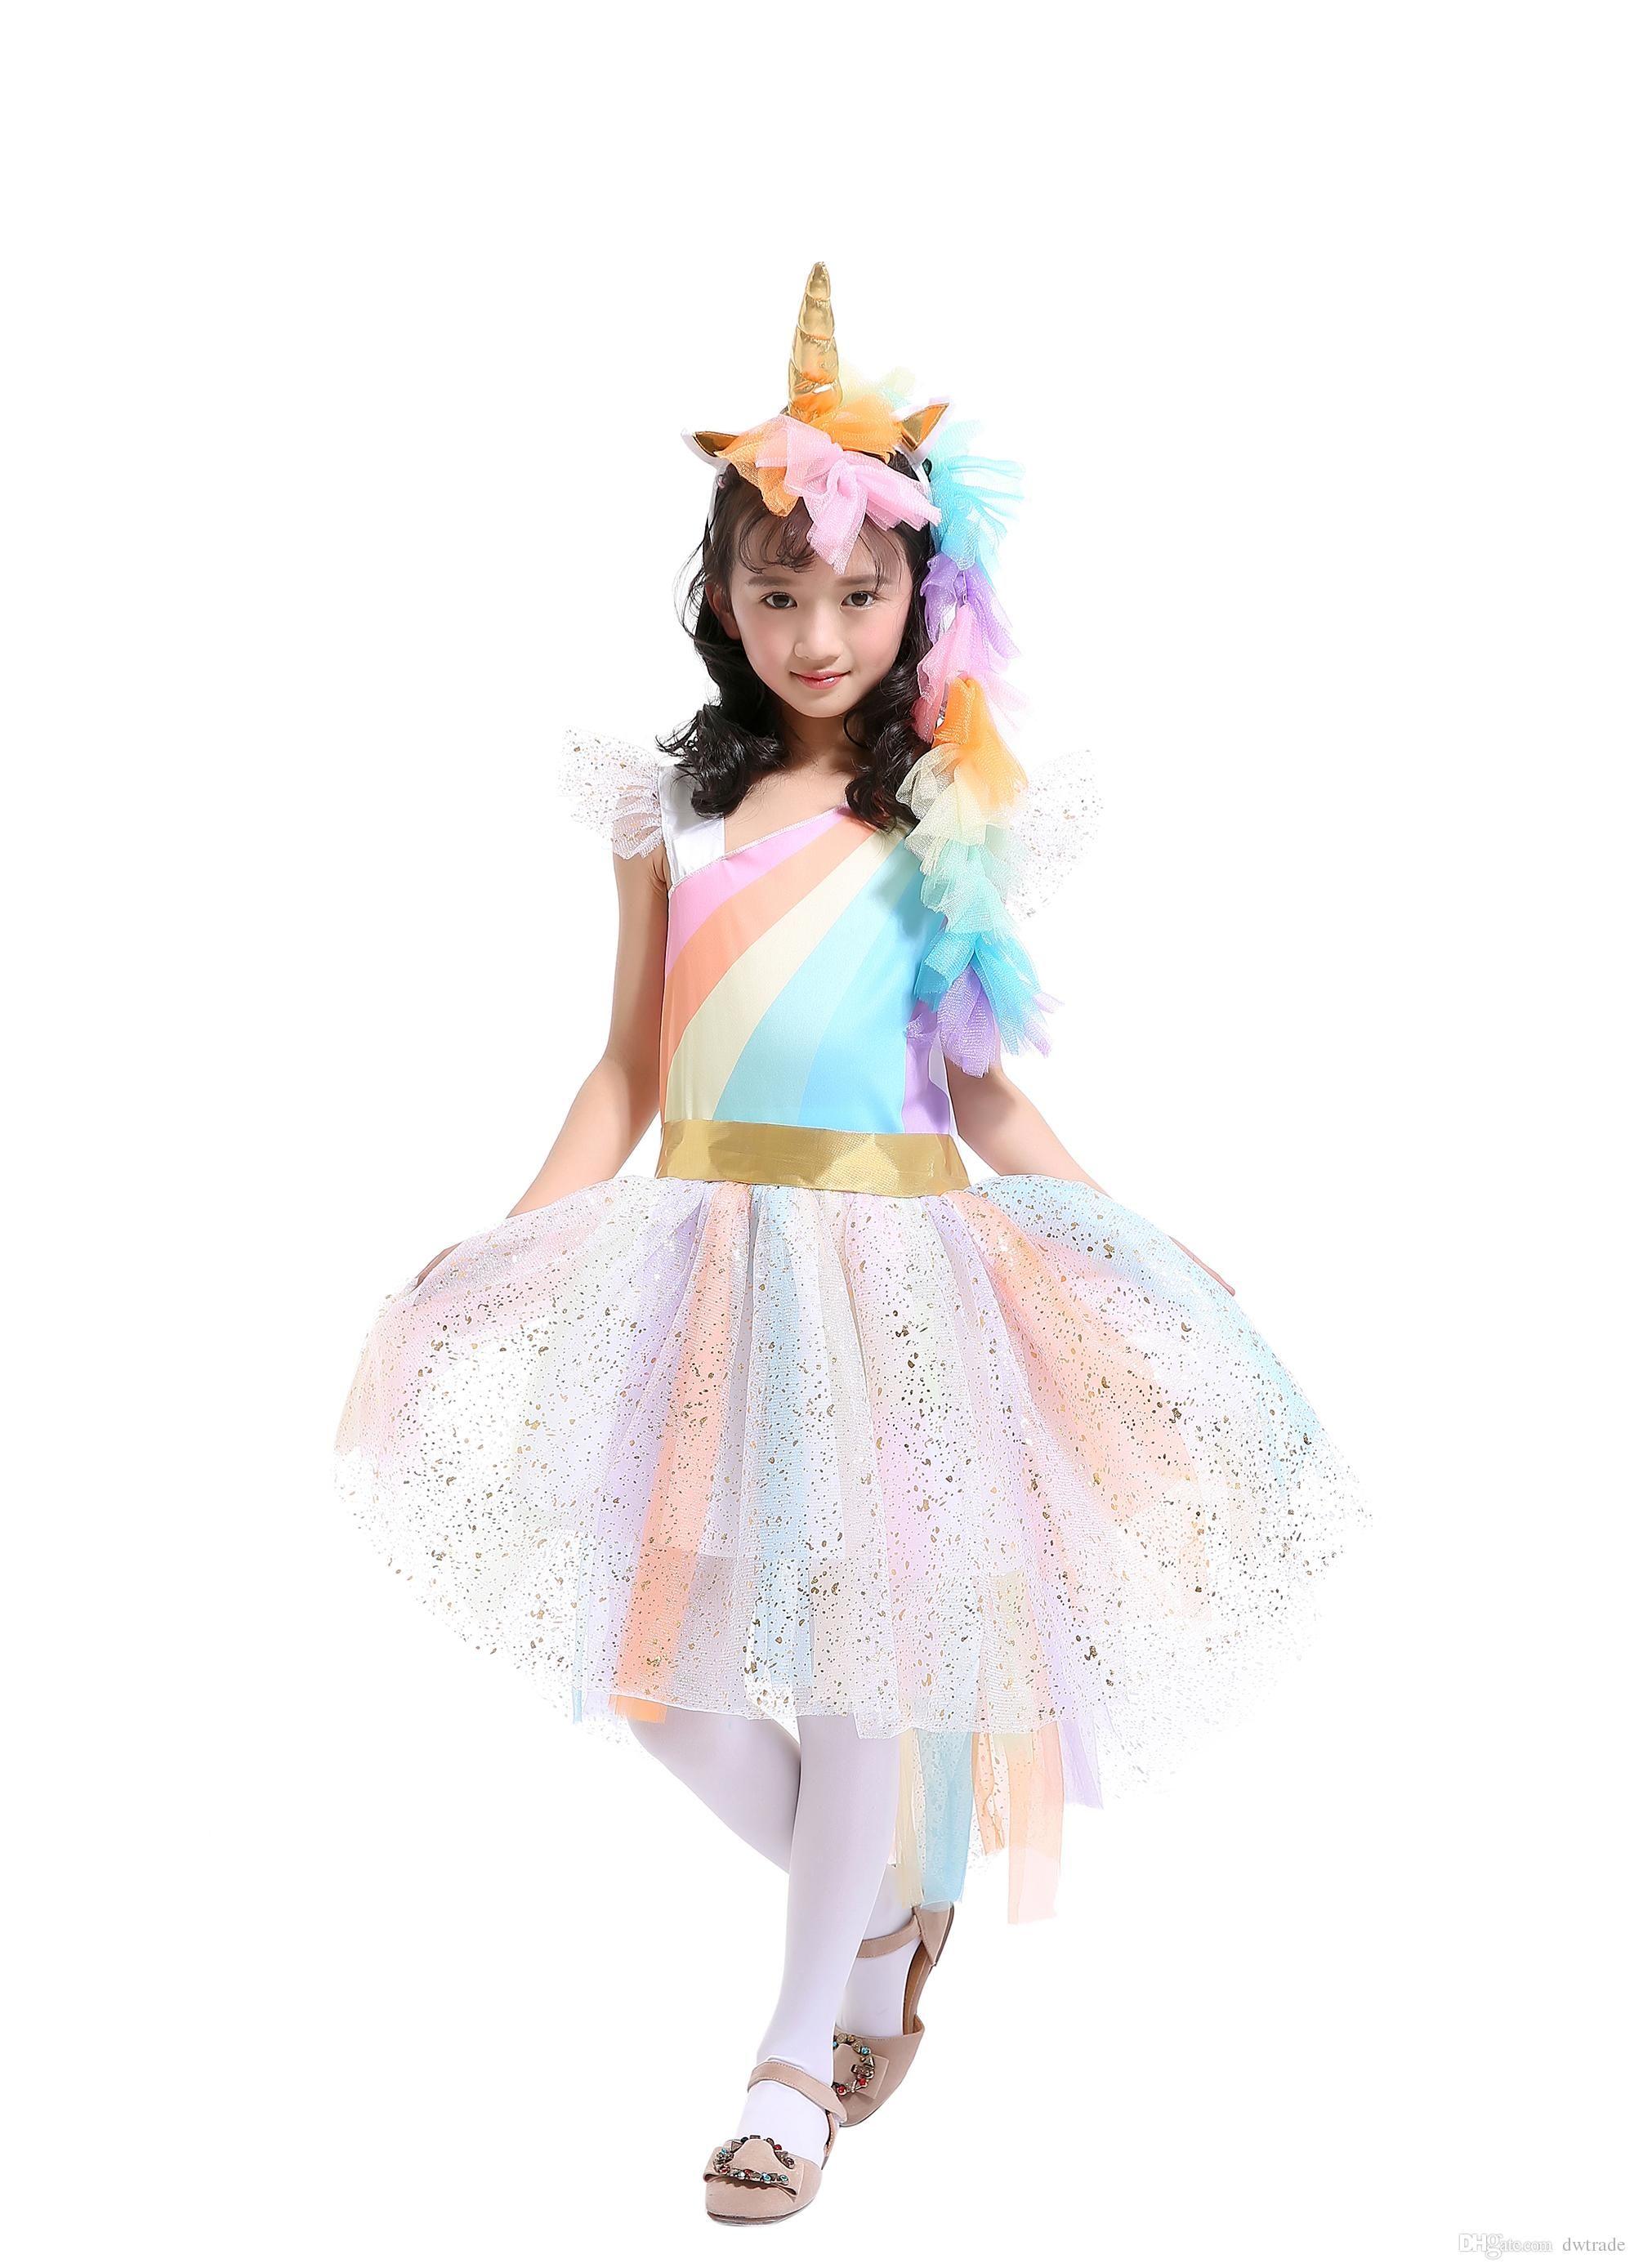 d845f9da396 Unicorn Princess Tutu Dress Suits With 1 Unicorn Corn Headband+1 Golden  Wings Cosplay Clothing Girls Stage Performance Dresses UK 2019 From  Zhang3344